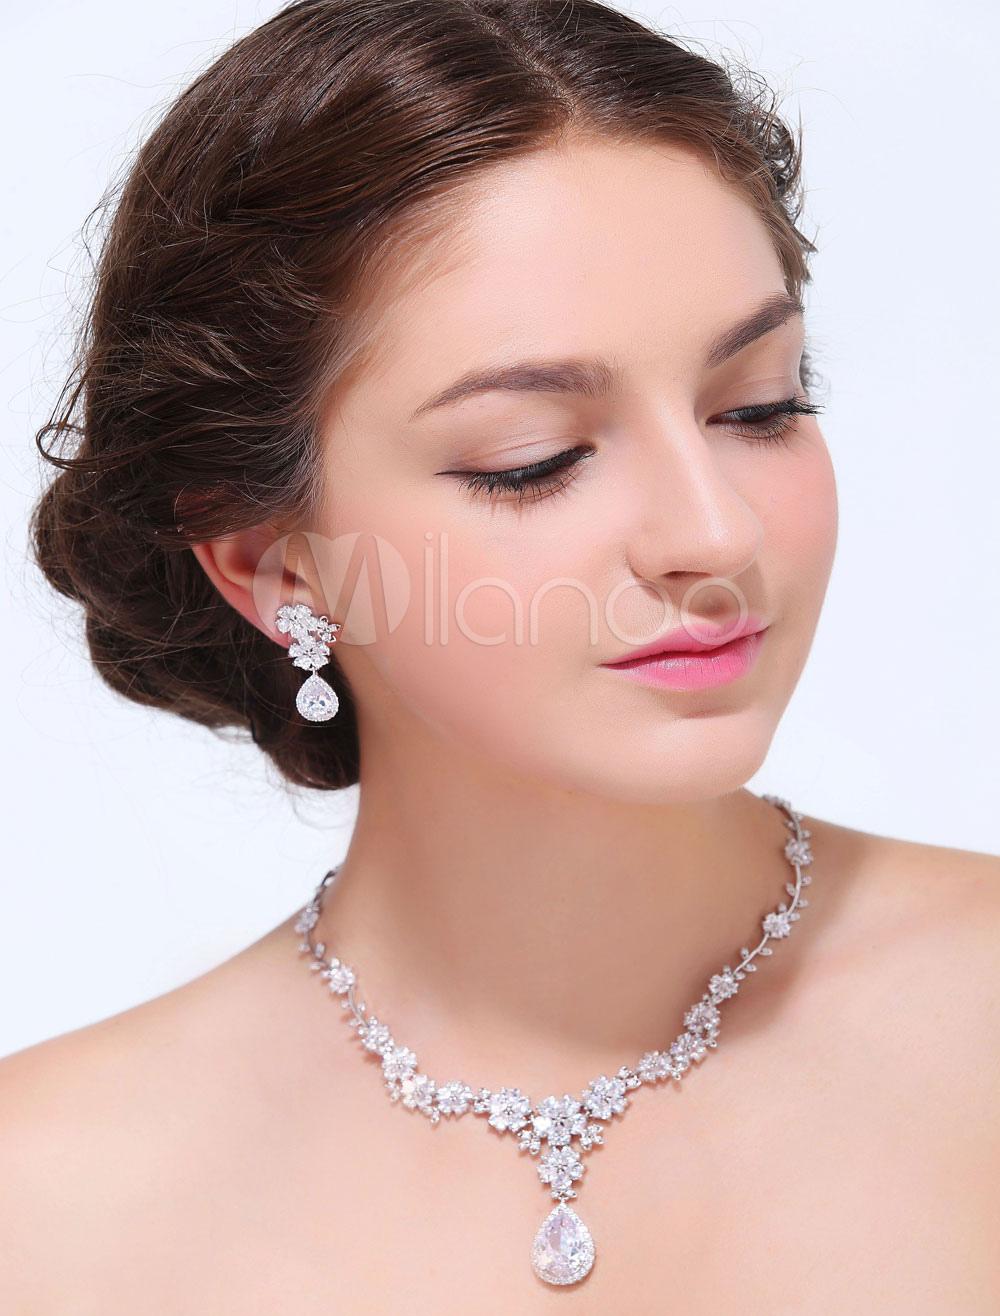 Silver Drops Alloy Wedding Earrings Necklace